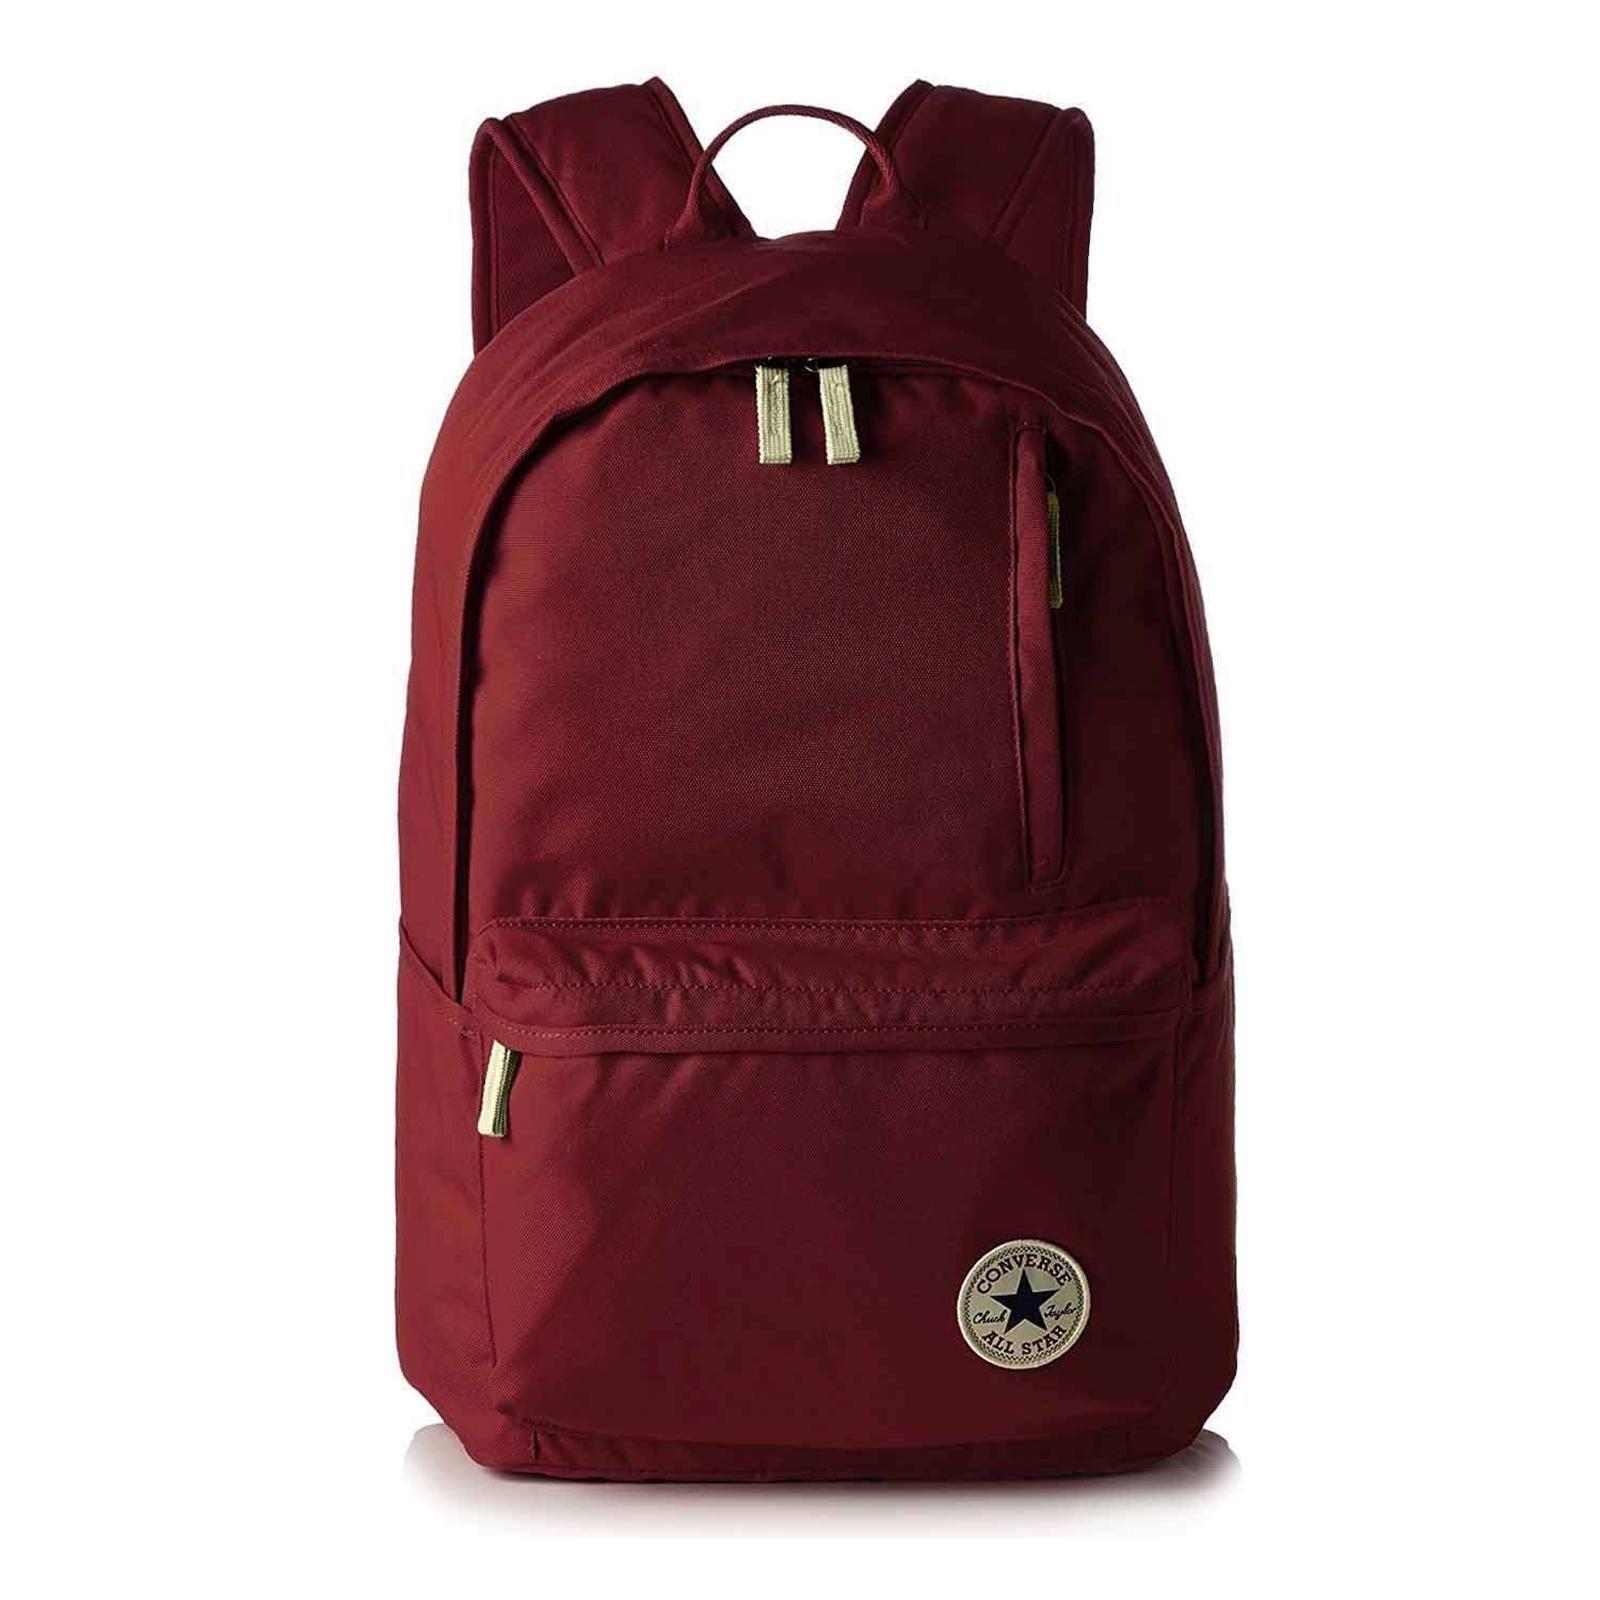 UNISEX CONVERSE Rucksack Core Poly ALL STAR City-Rucksack Freizeit Reise  Urlaub Erwachsene Kinder Daypack Backpack Chuck Taylor Stern… 4ad7f3d74b50e